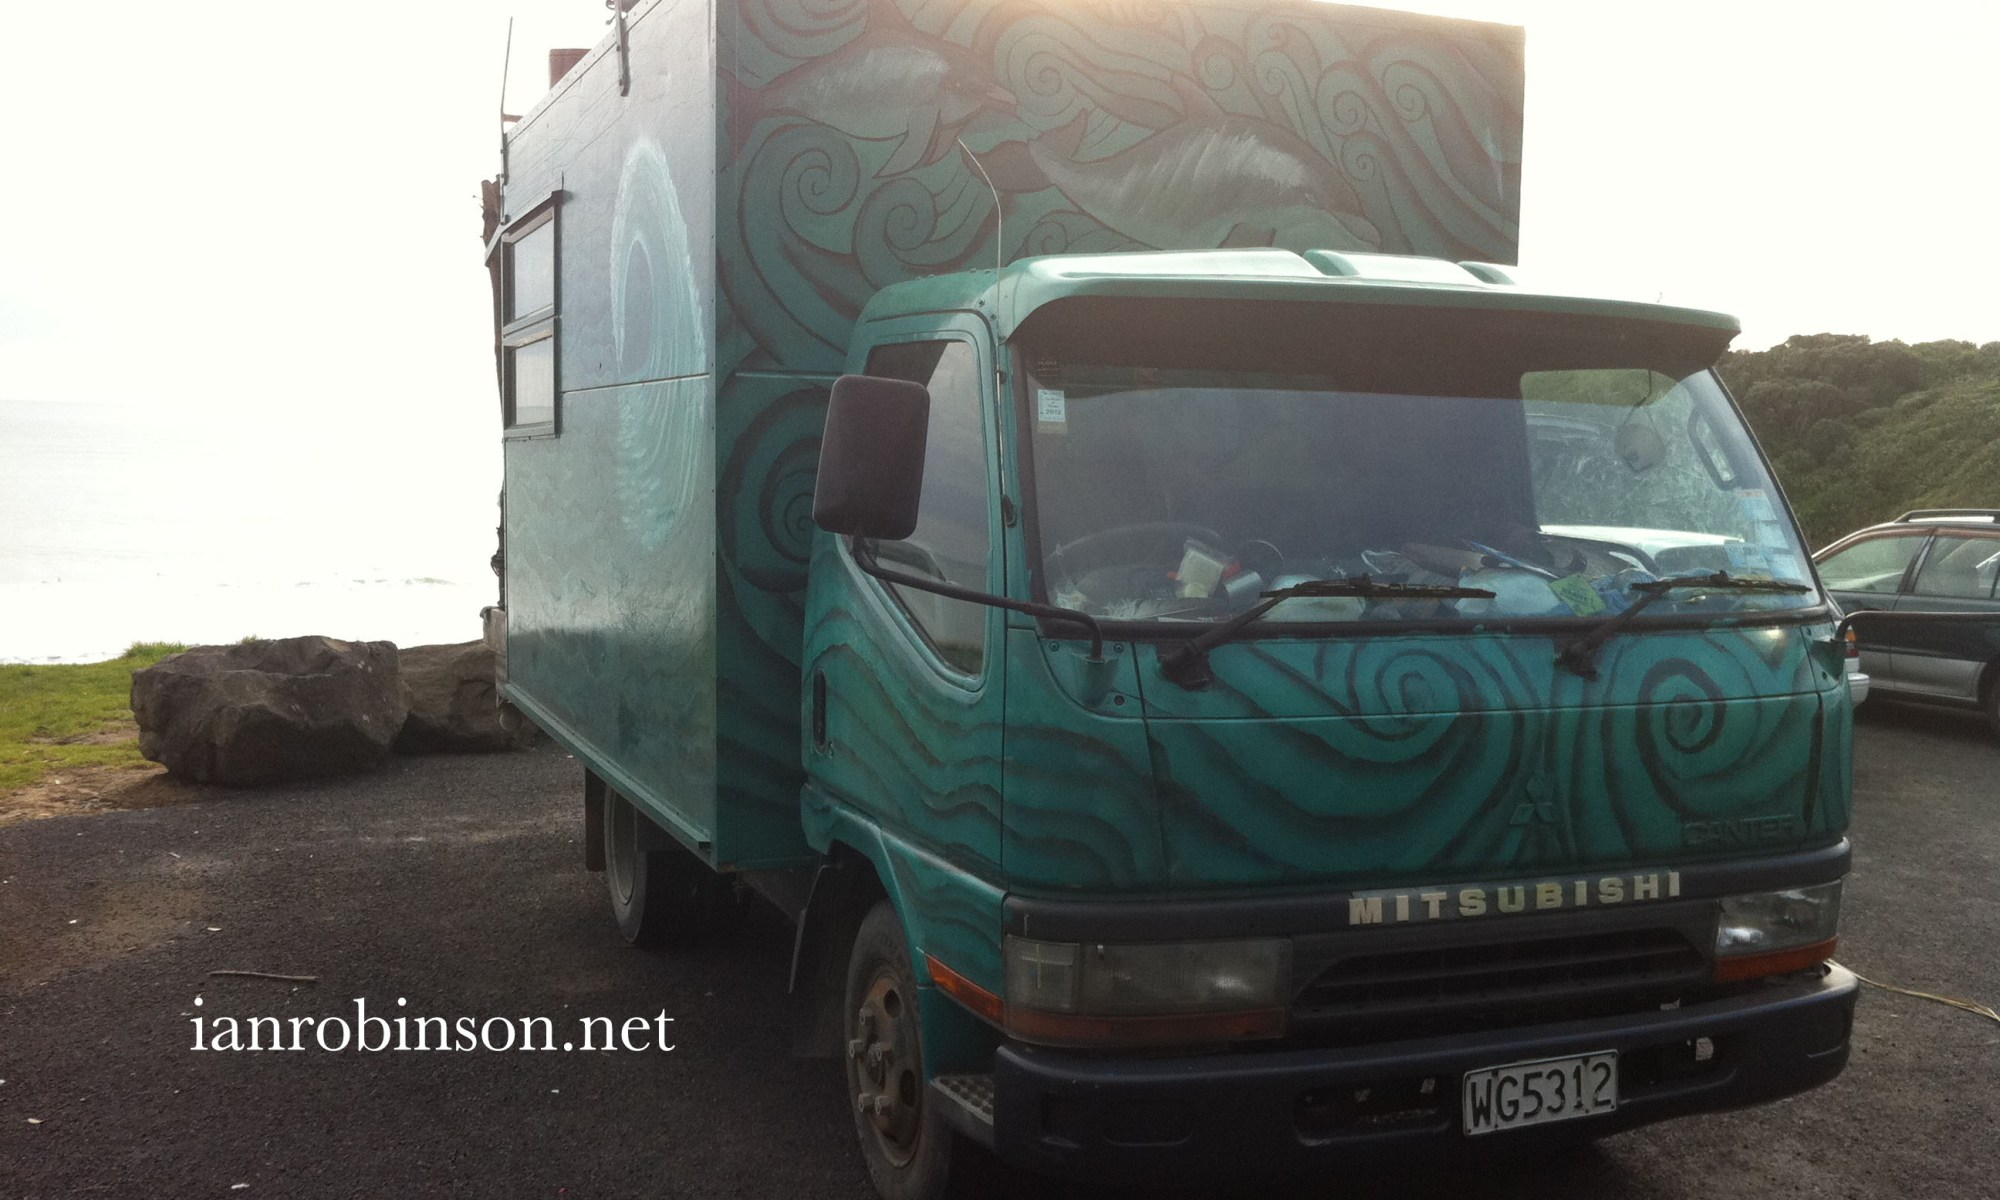 Permanent New Zealand Nomad Mobile 1